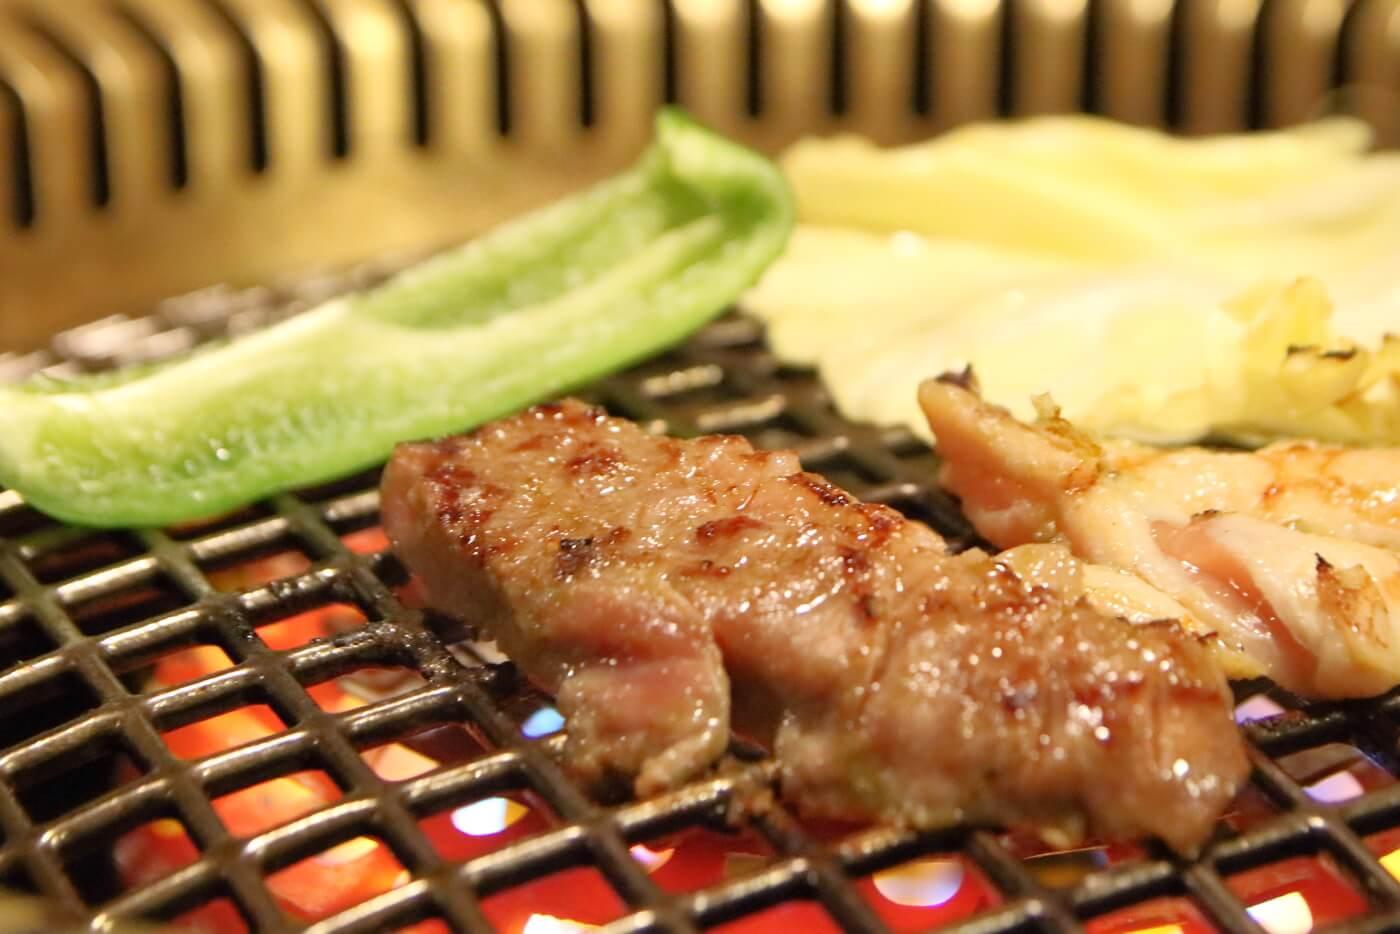 焼肉菜館 大五郎 焼肉ランチ